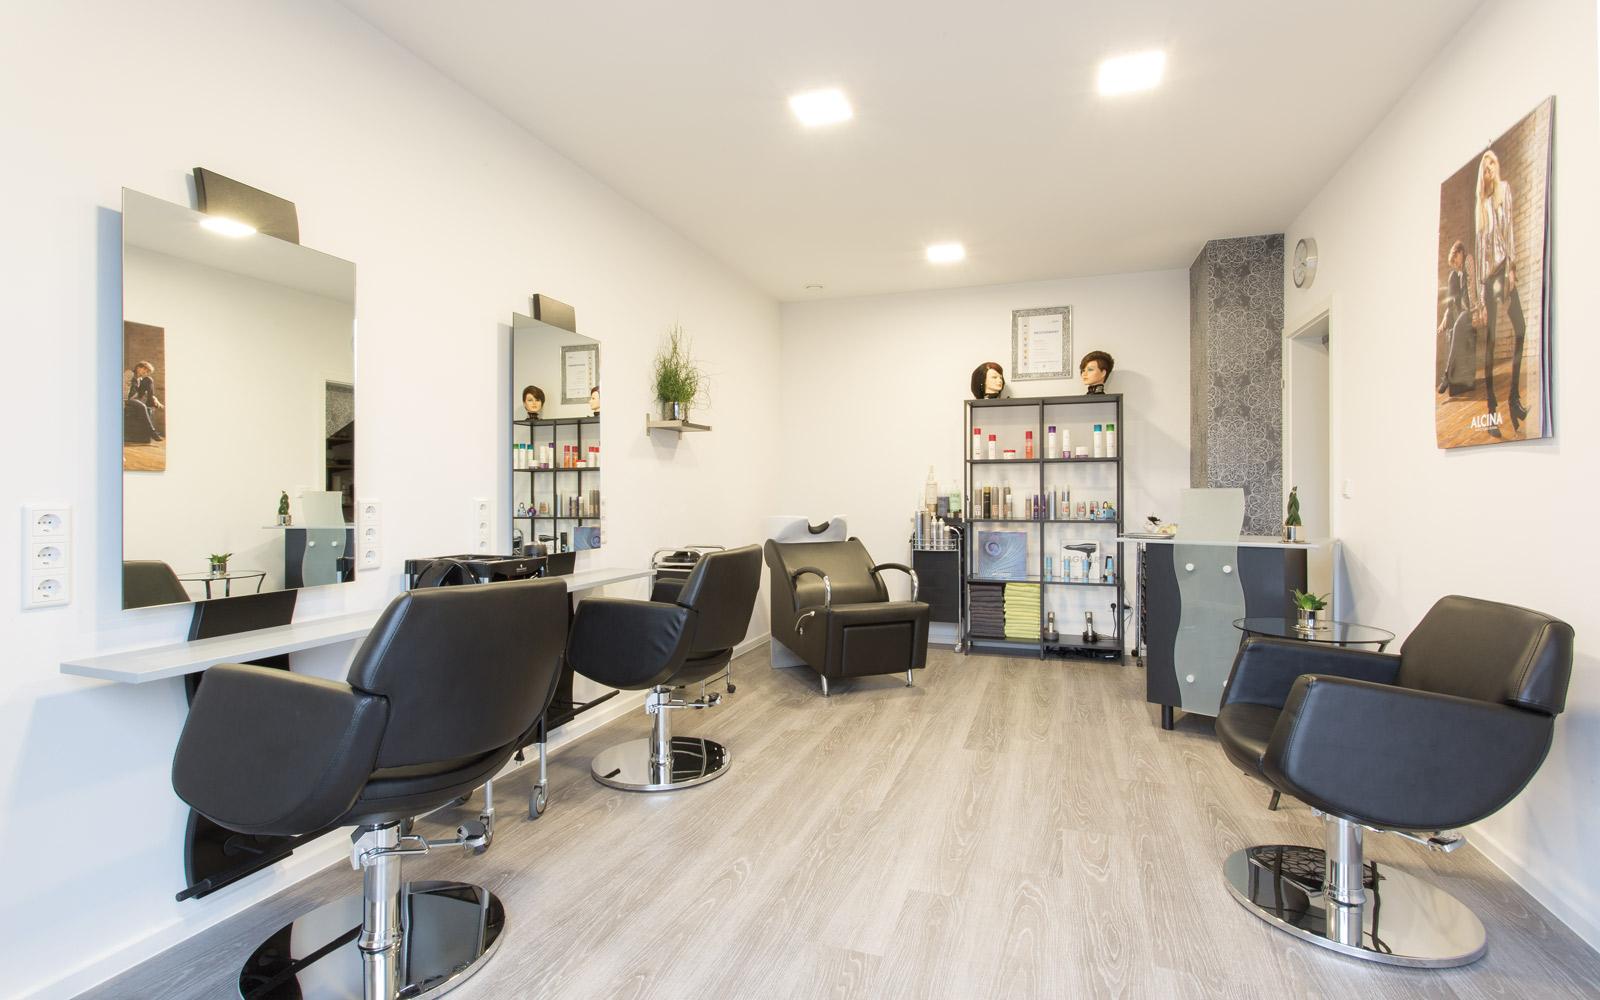 Unser Salon - Friseursalon Antje Berste